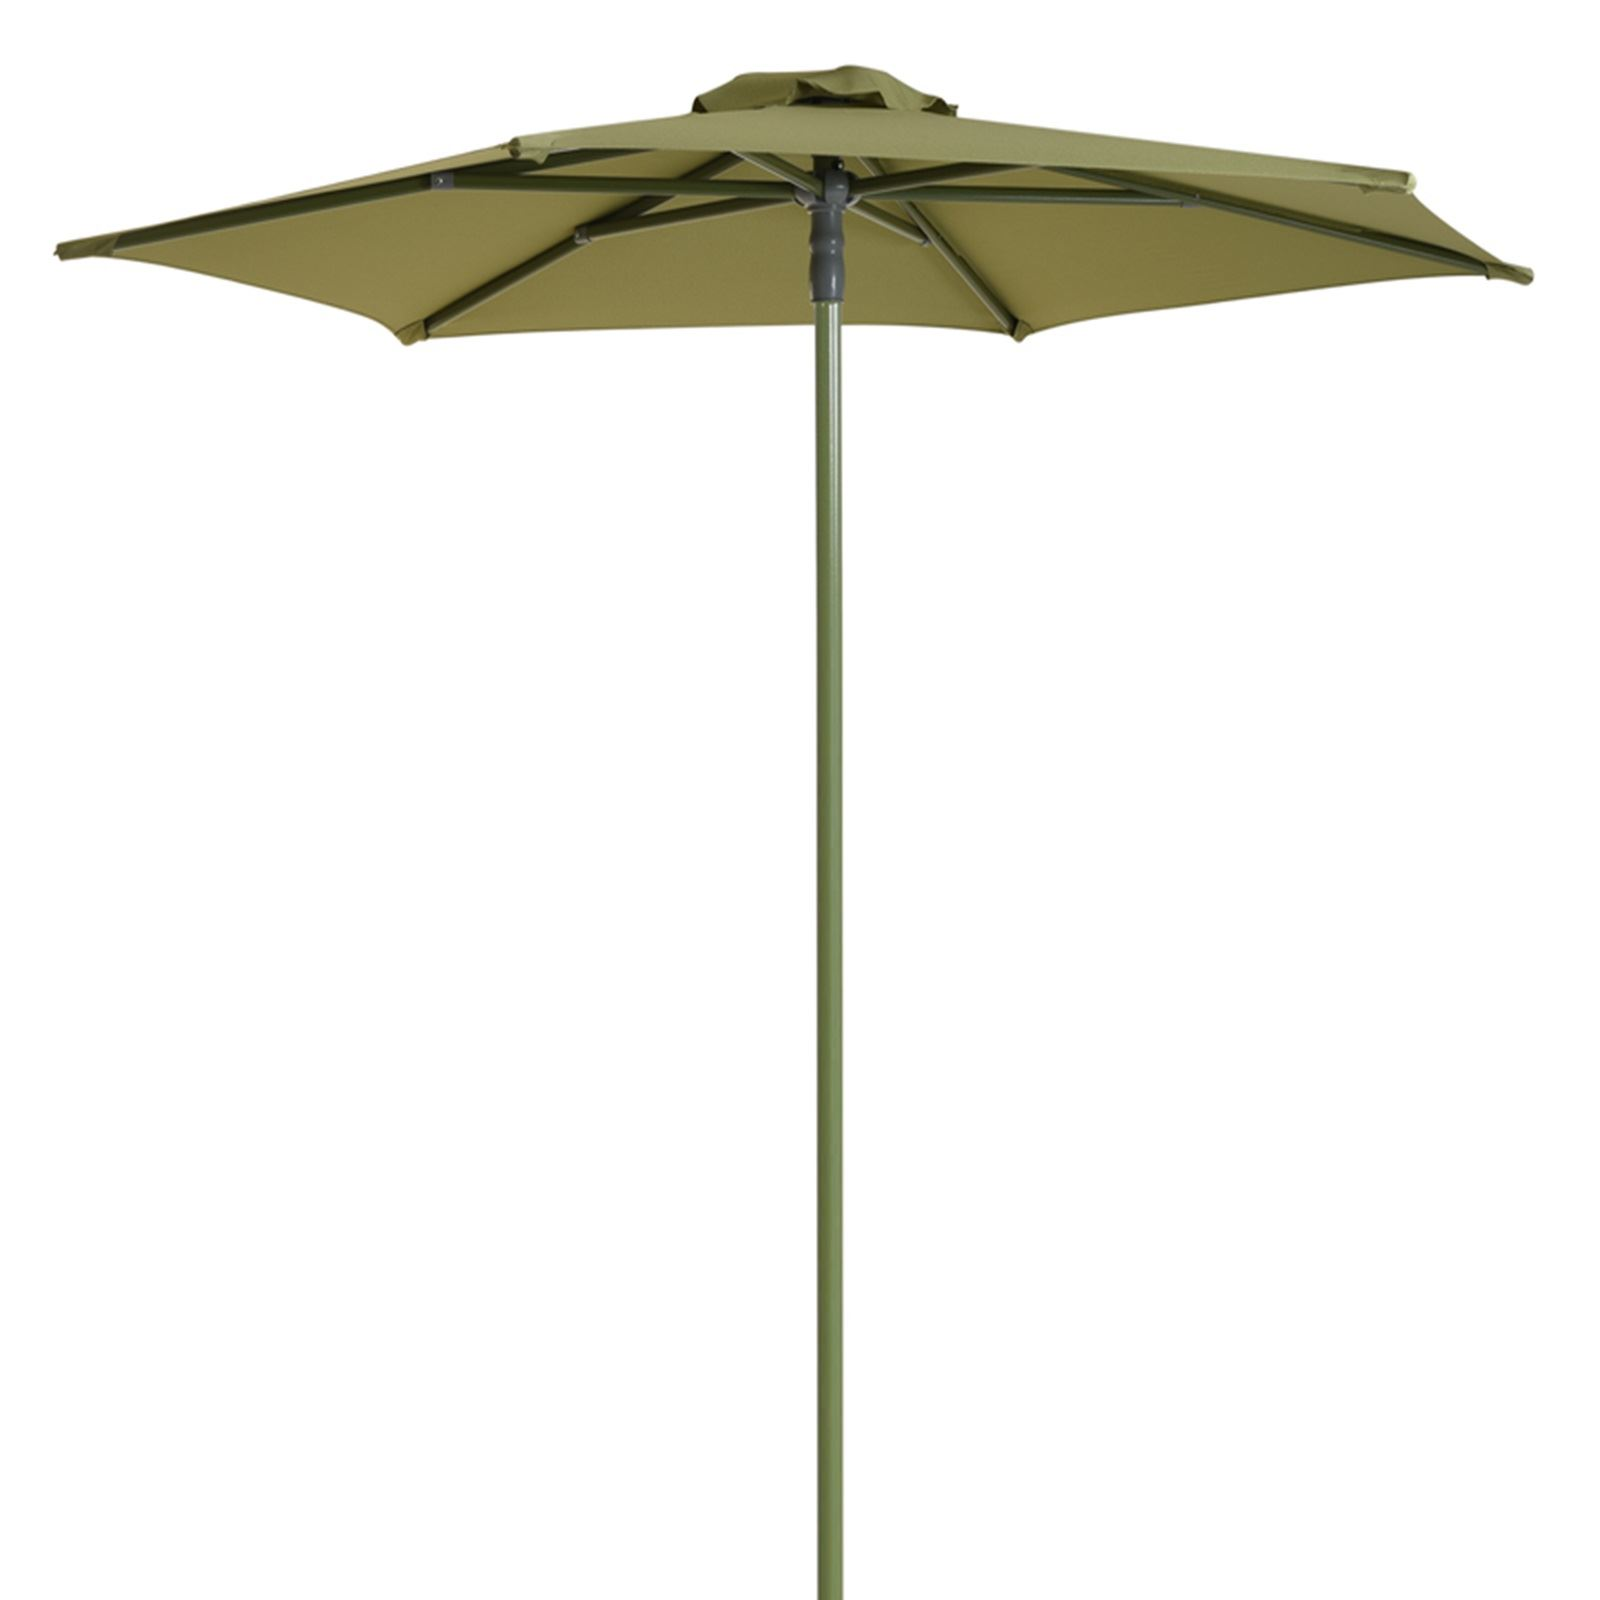 large garden umbrella parasol beach patio outdoor table sun canopy shade shelter ebay. Black Bedroom Furniture Sets. Home Design Ideas